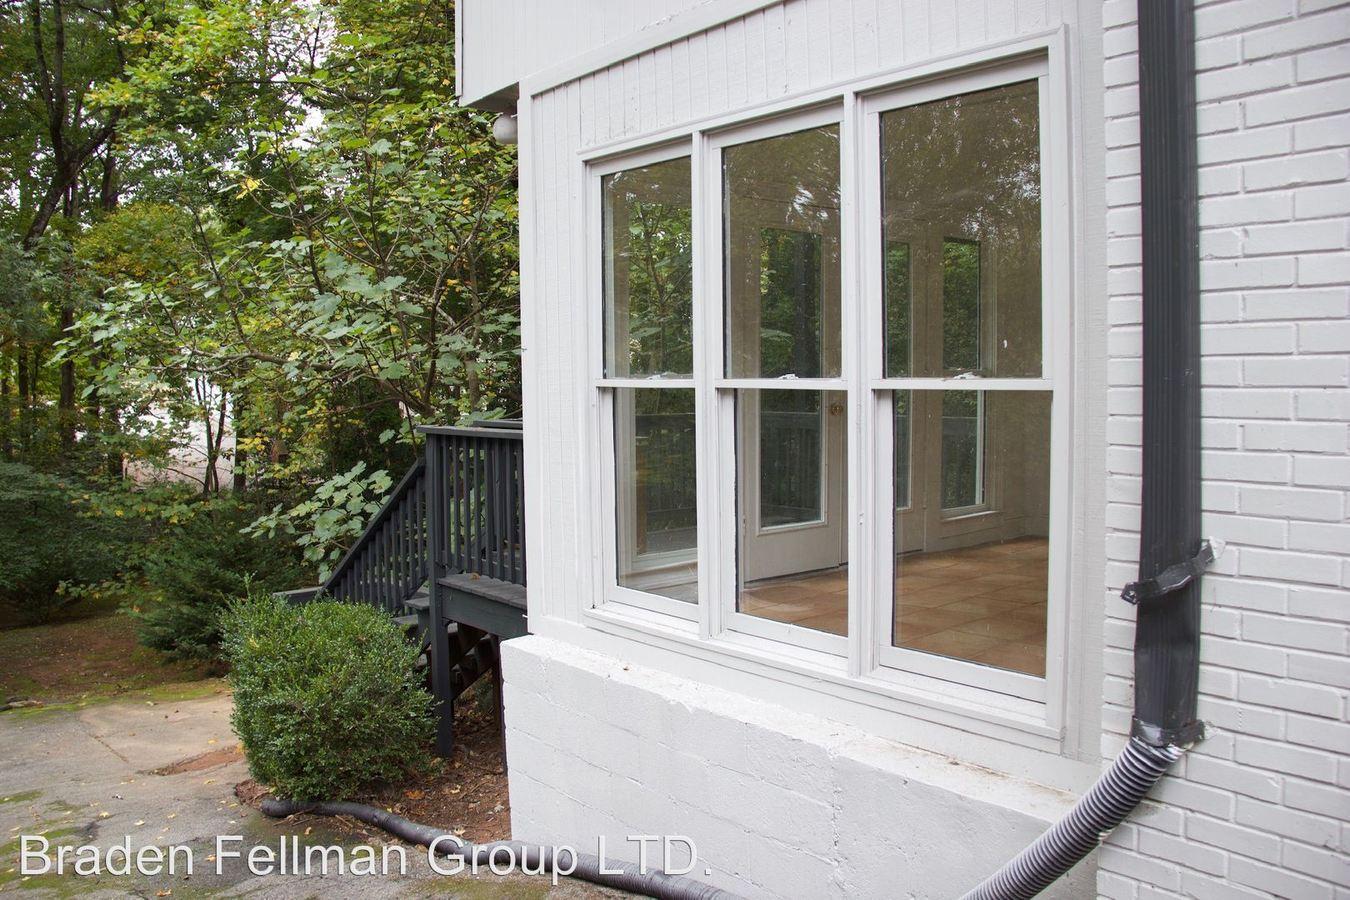 2 Bedrooms 1 Bathroom Apartment for rent at 219 Hillcrest Avenue in Decatur, GA